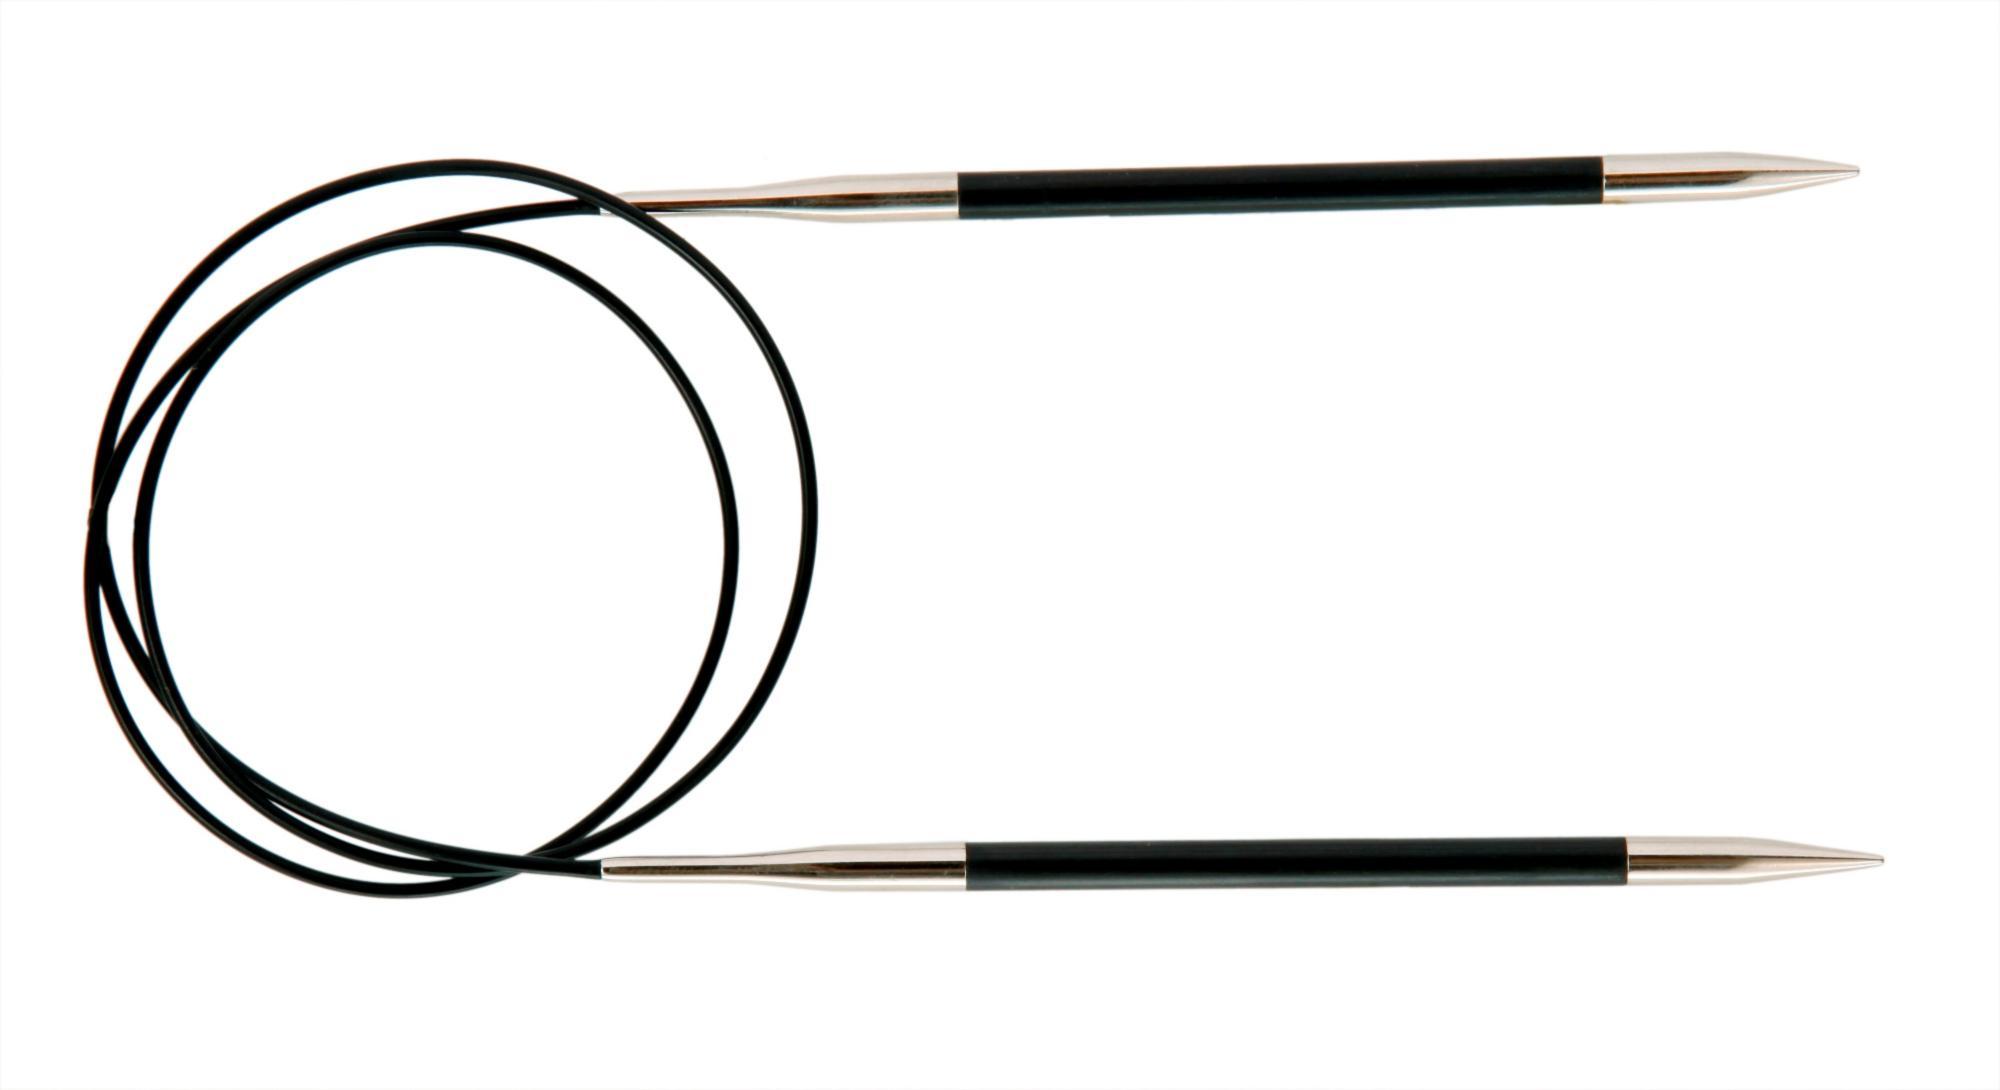 Спицы круговые 80 см Karbonz KnitPro, 41181, 2.25 мм